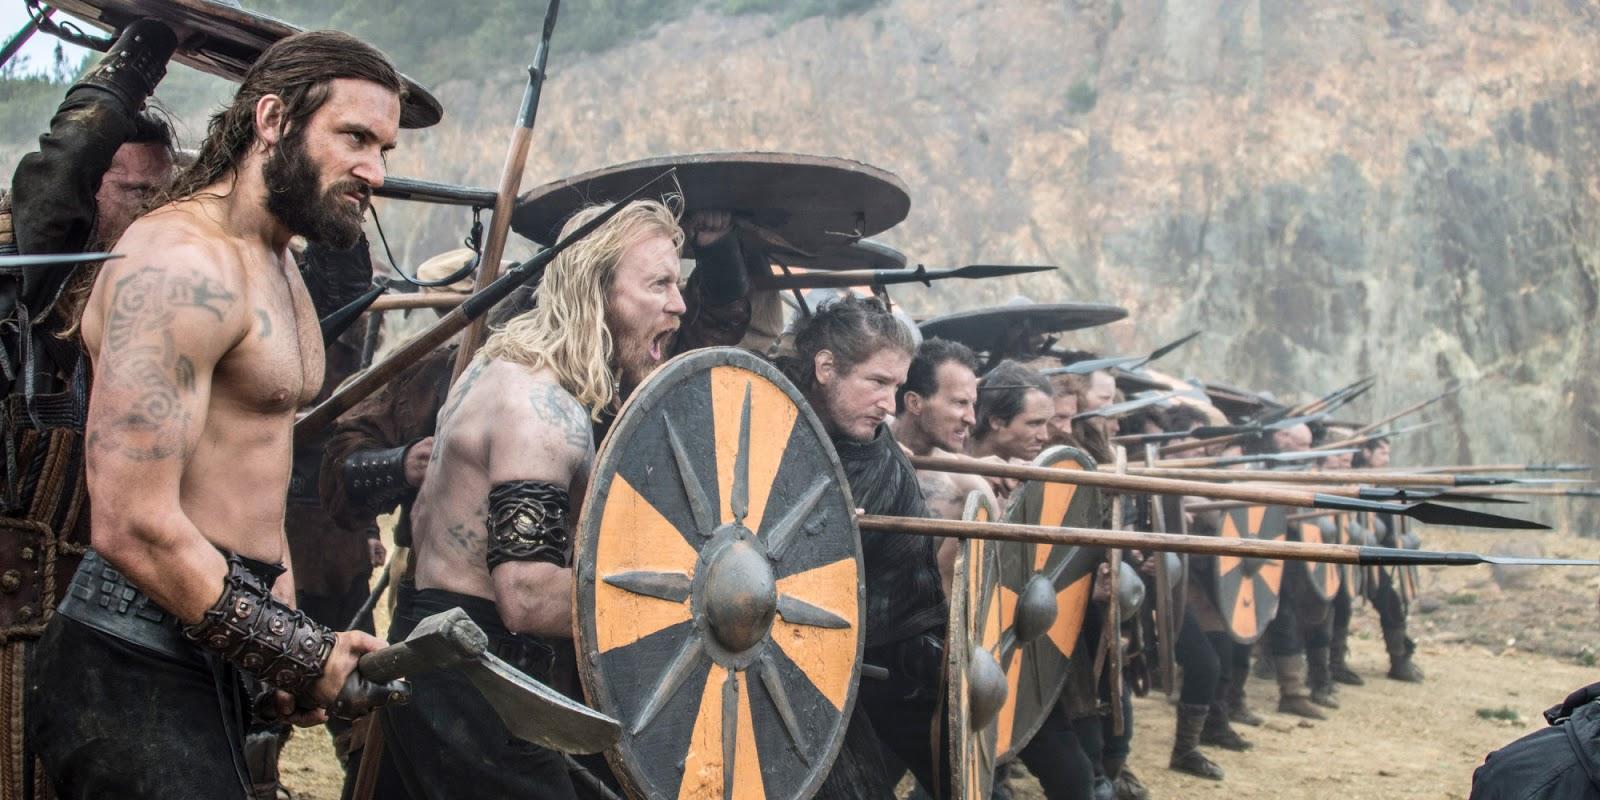 5-series-tipo-GOT-vikings